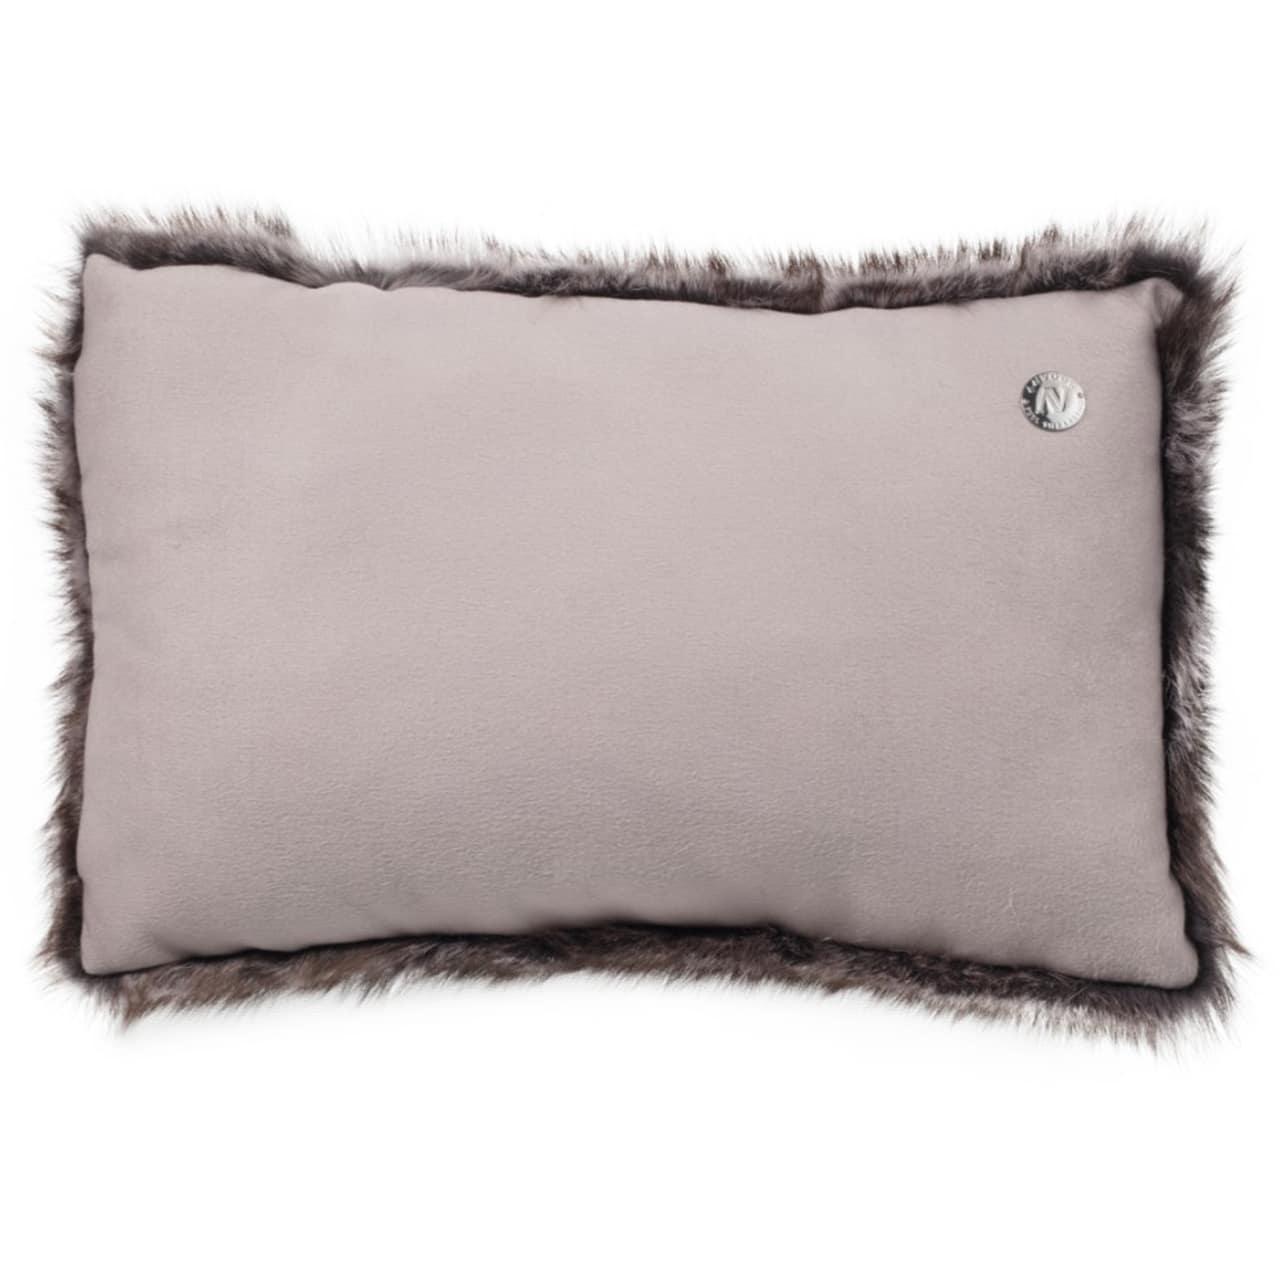 NEW-Shearling Pillow- Sable- 35x55cm (SPSABTO3555) arka - ANVOGG FEEL SHEARLING | ANVOGG